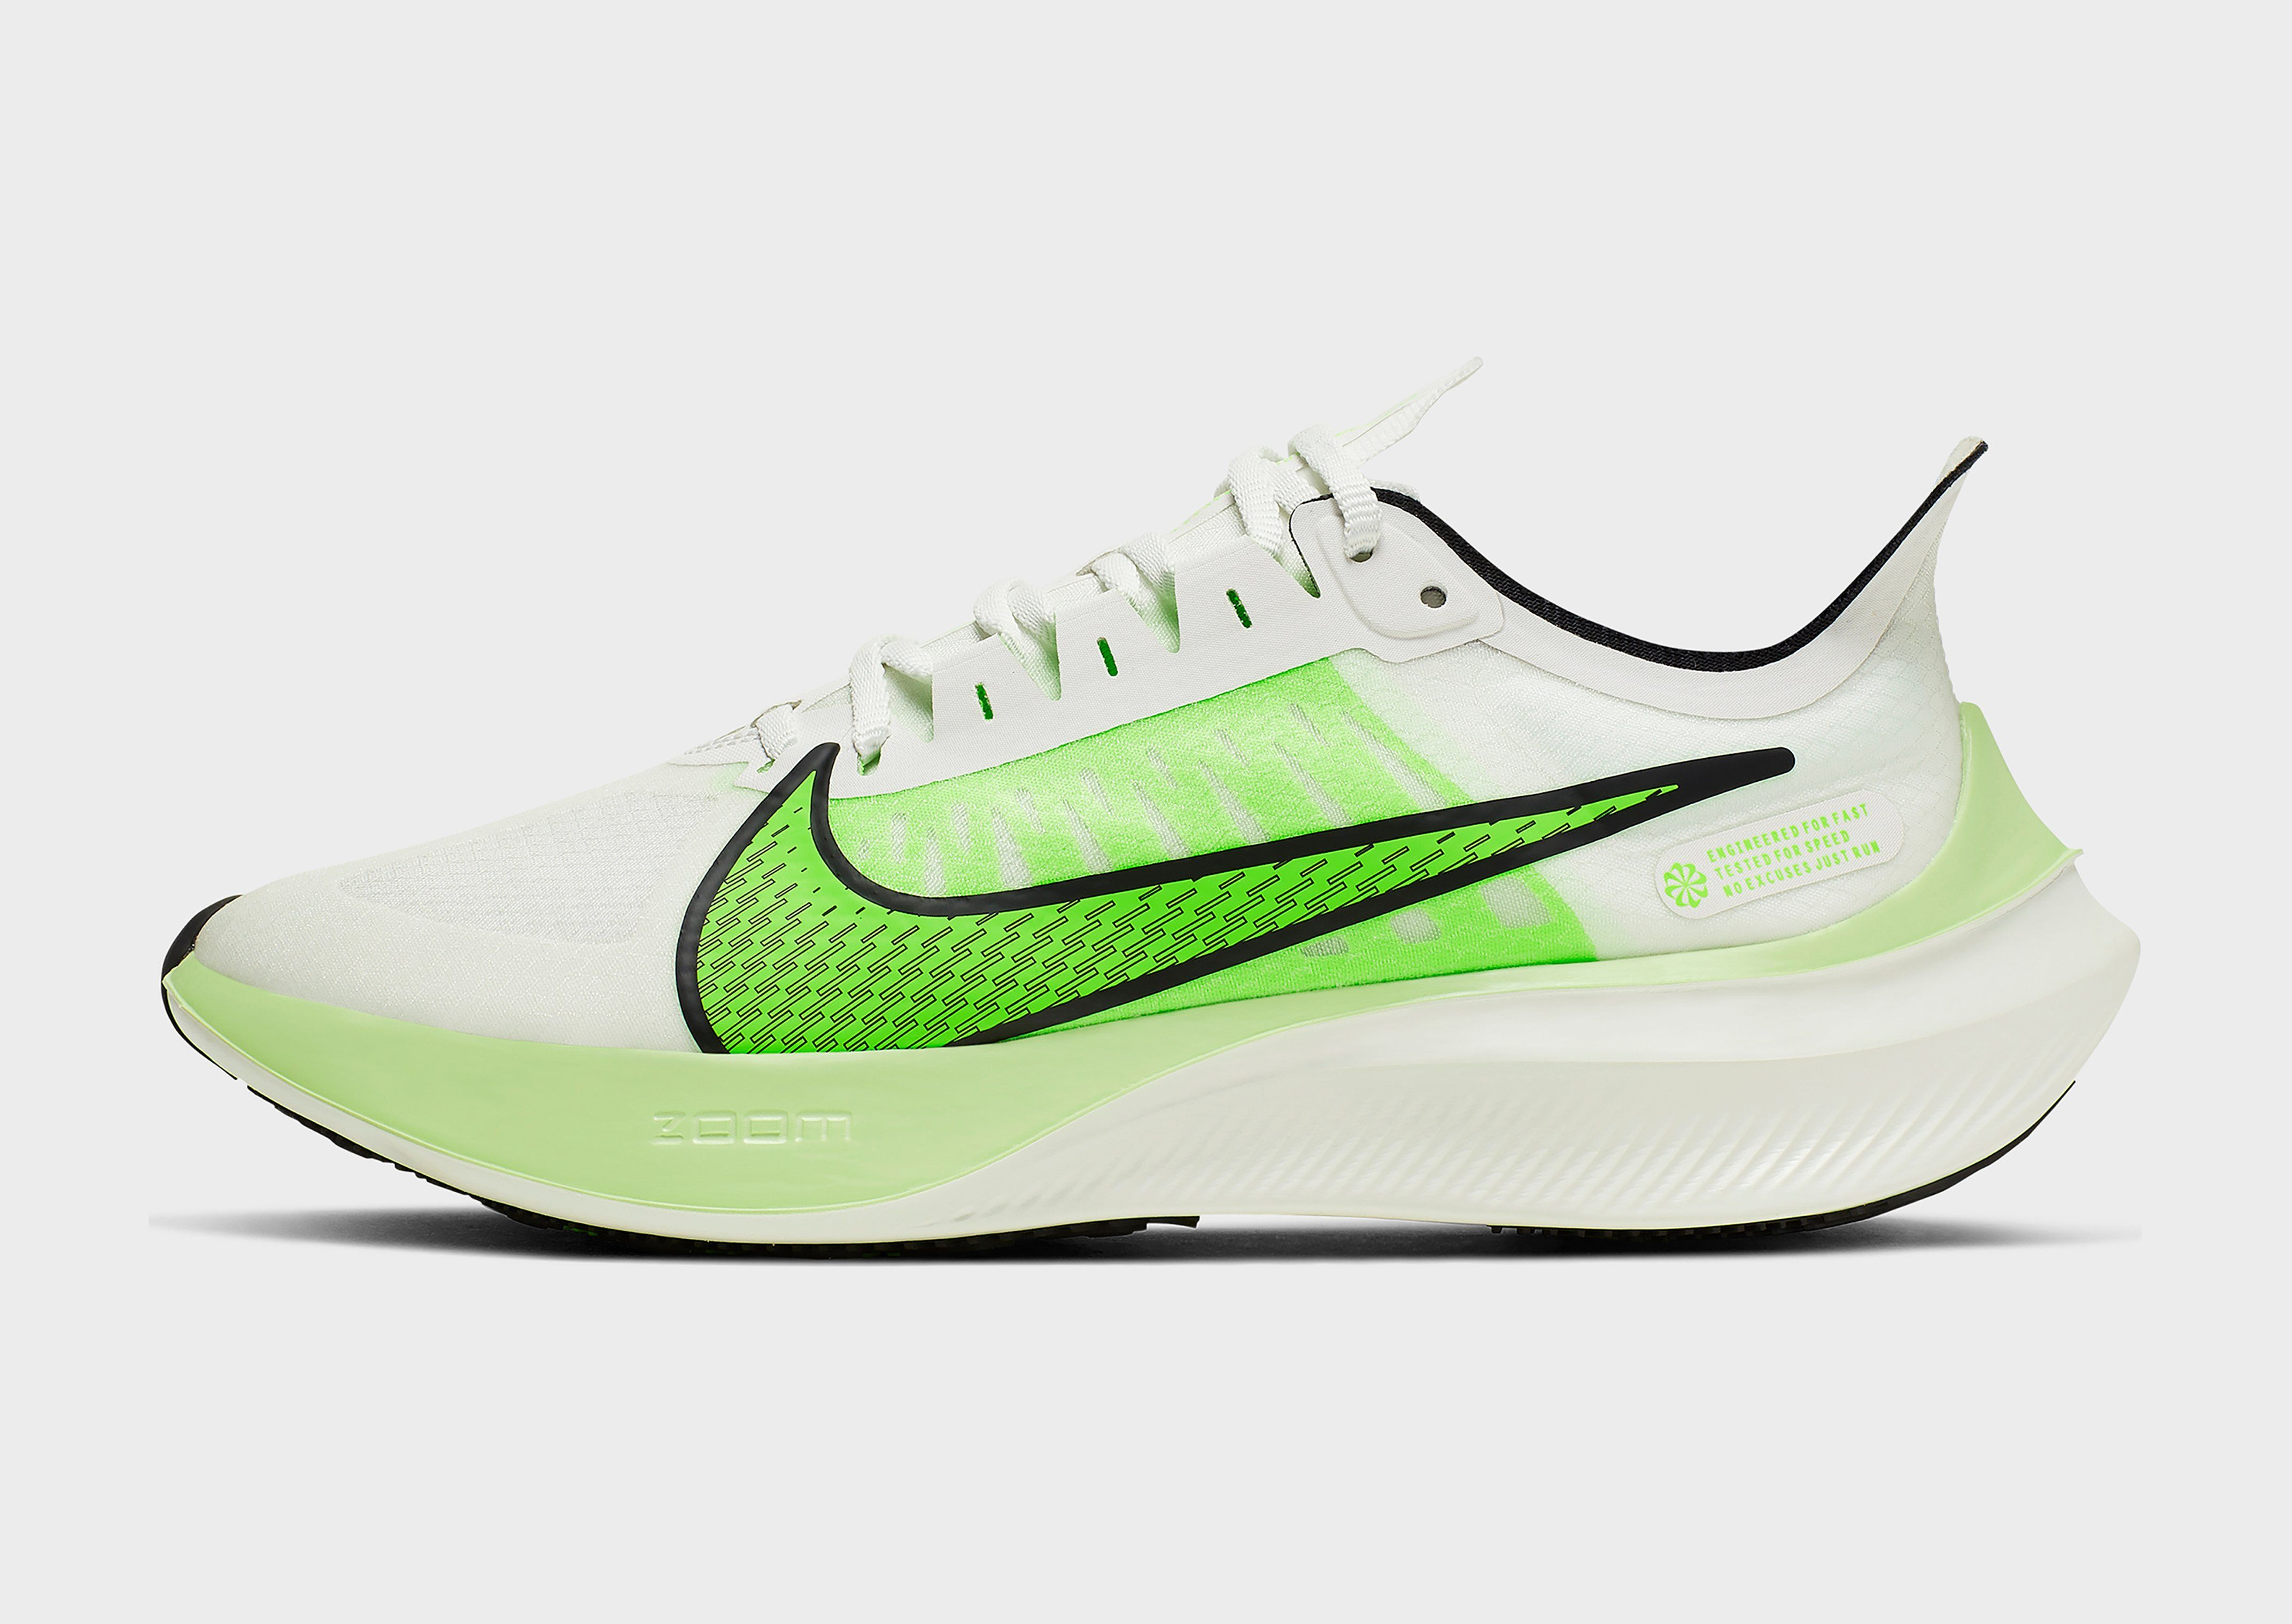 sale retailer 128a3 f63e3 Nike Zoom Gravity Women's Running Shoe | JD Sports